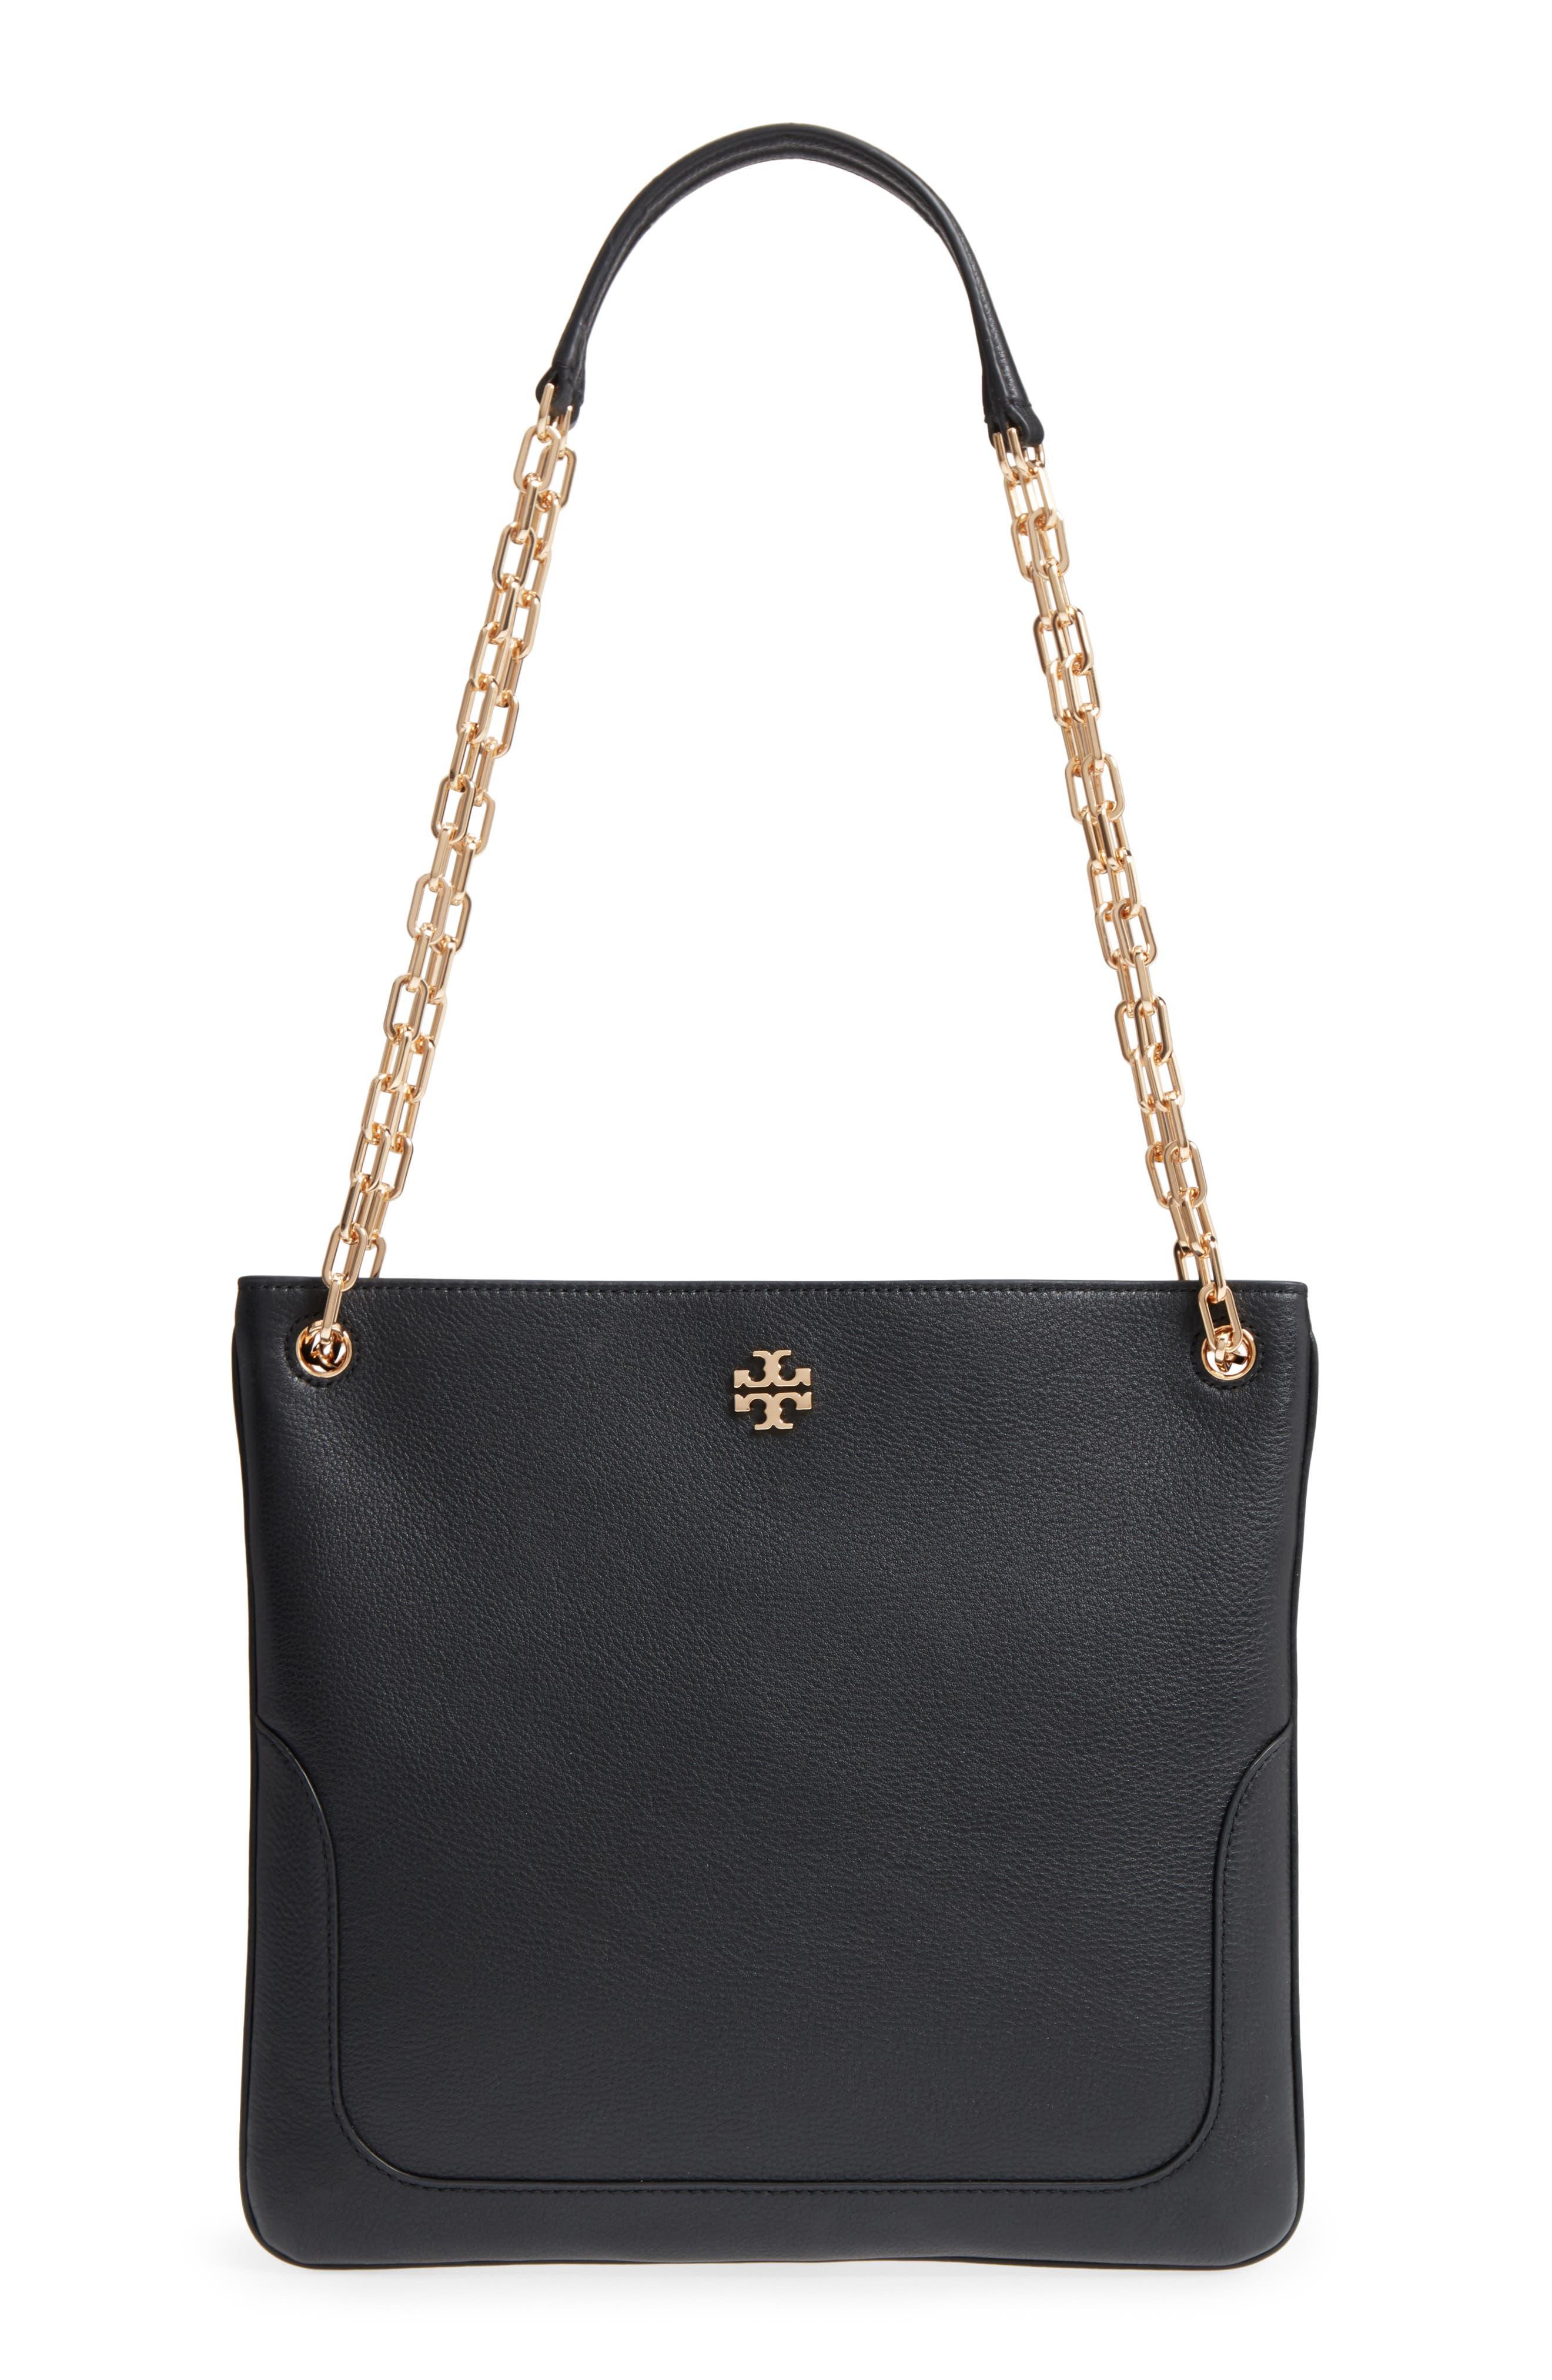 TORY BURCH Marsden Swingpack Leather Crossbody Bag, Main, color, 001